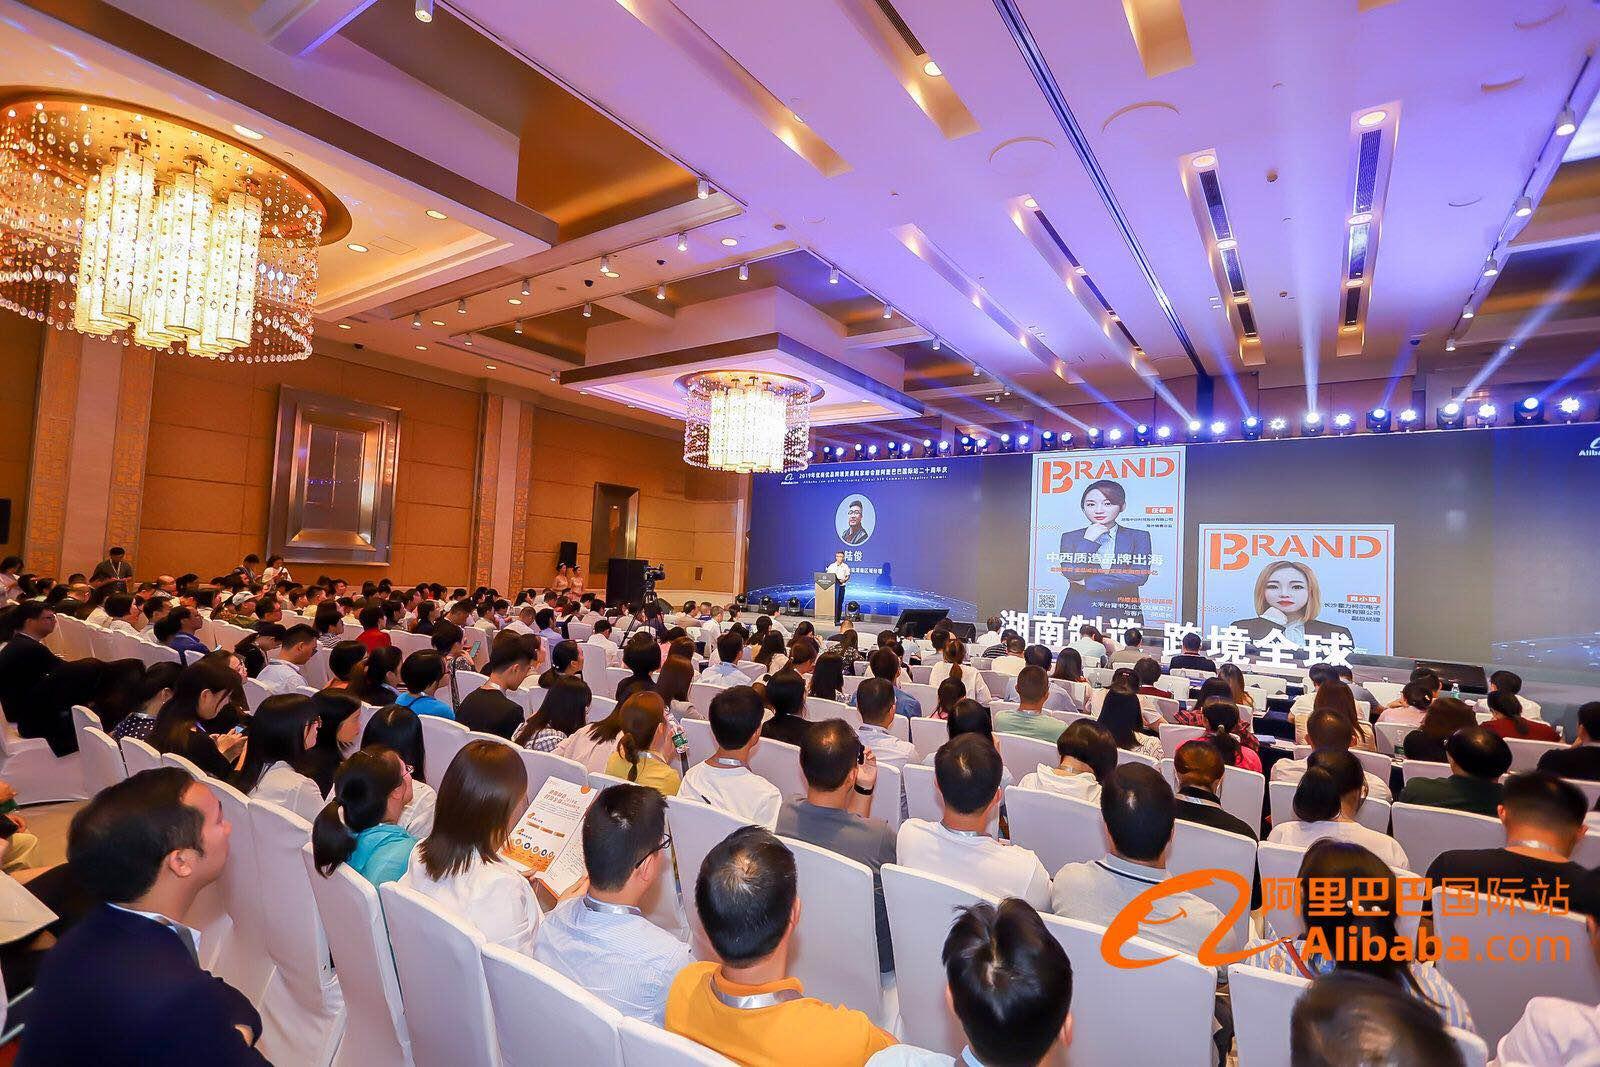 http://www.110tao.com/dianshanglingshou/73931.html